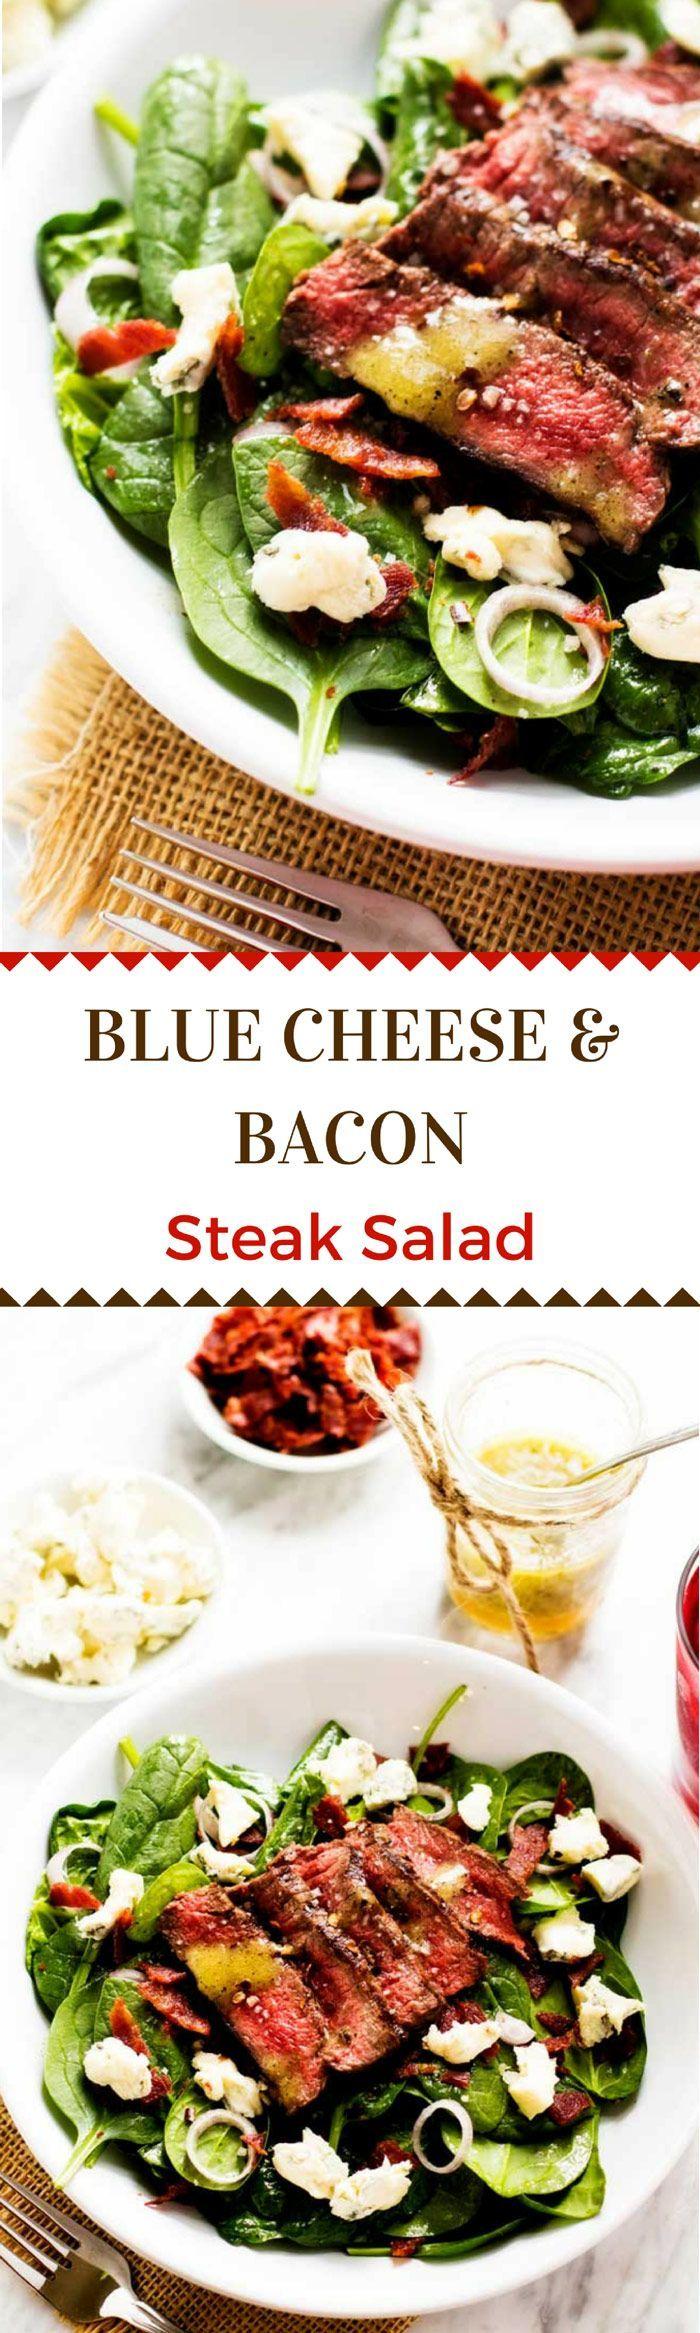 Blue Cheese & Bacon Steak Salad via @wendypolisi